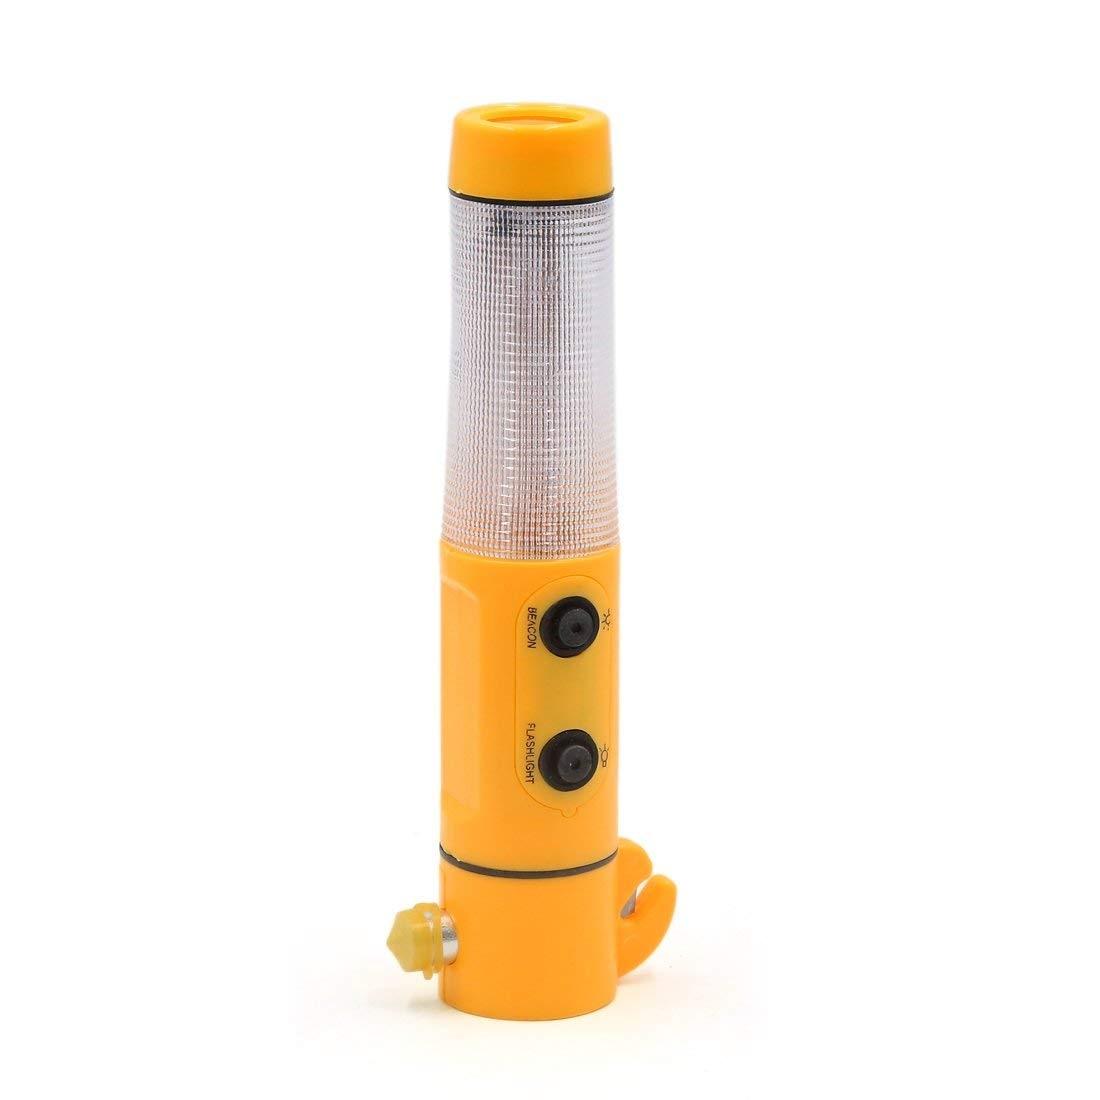 uxcell 19.5 x 6.5cm Emergency Window Glass Break Car Vehicle Flashlight Hammer Cutter Yellow